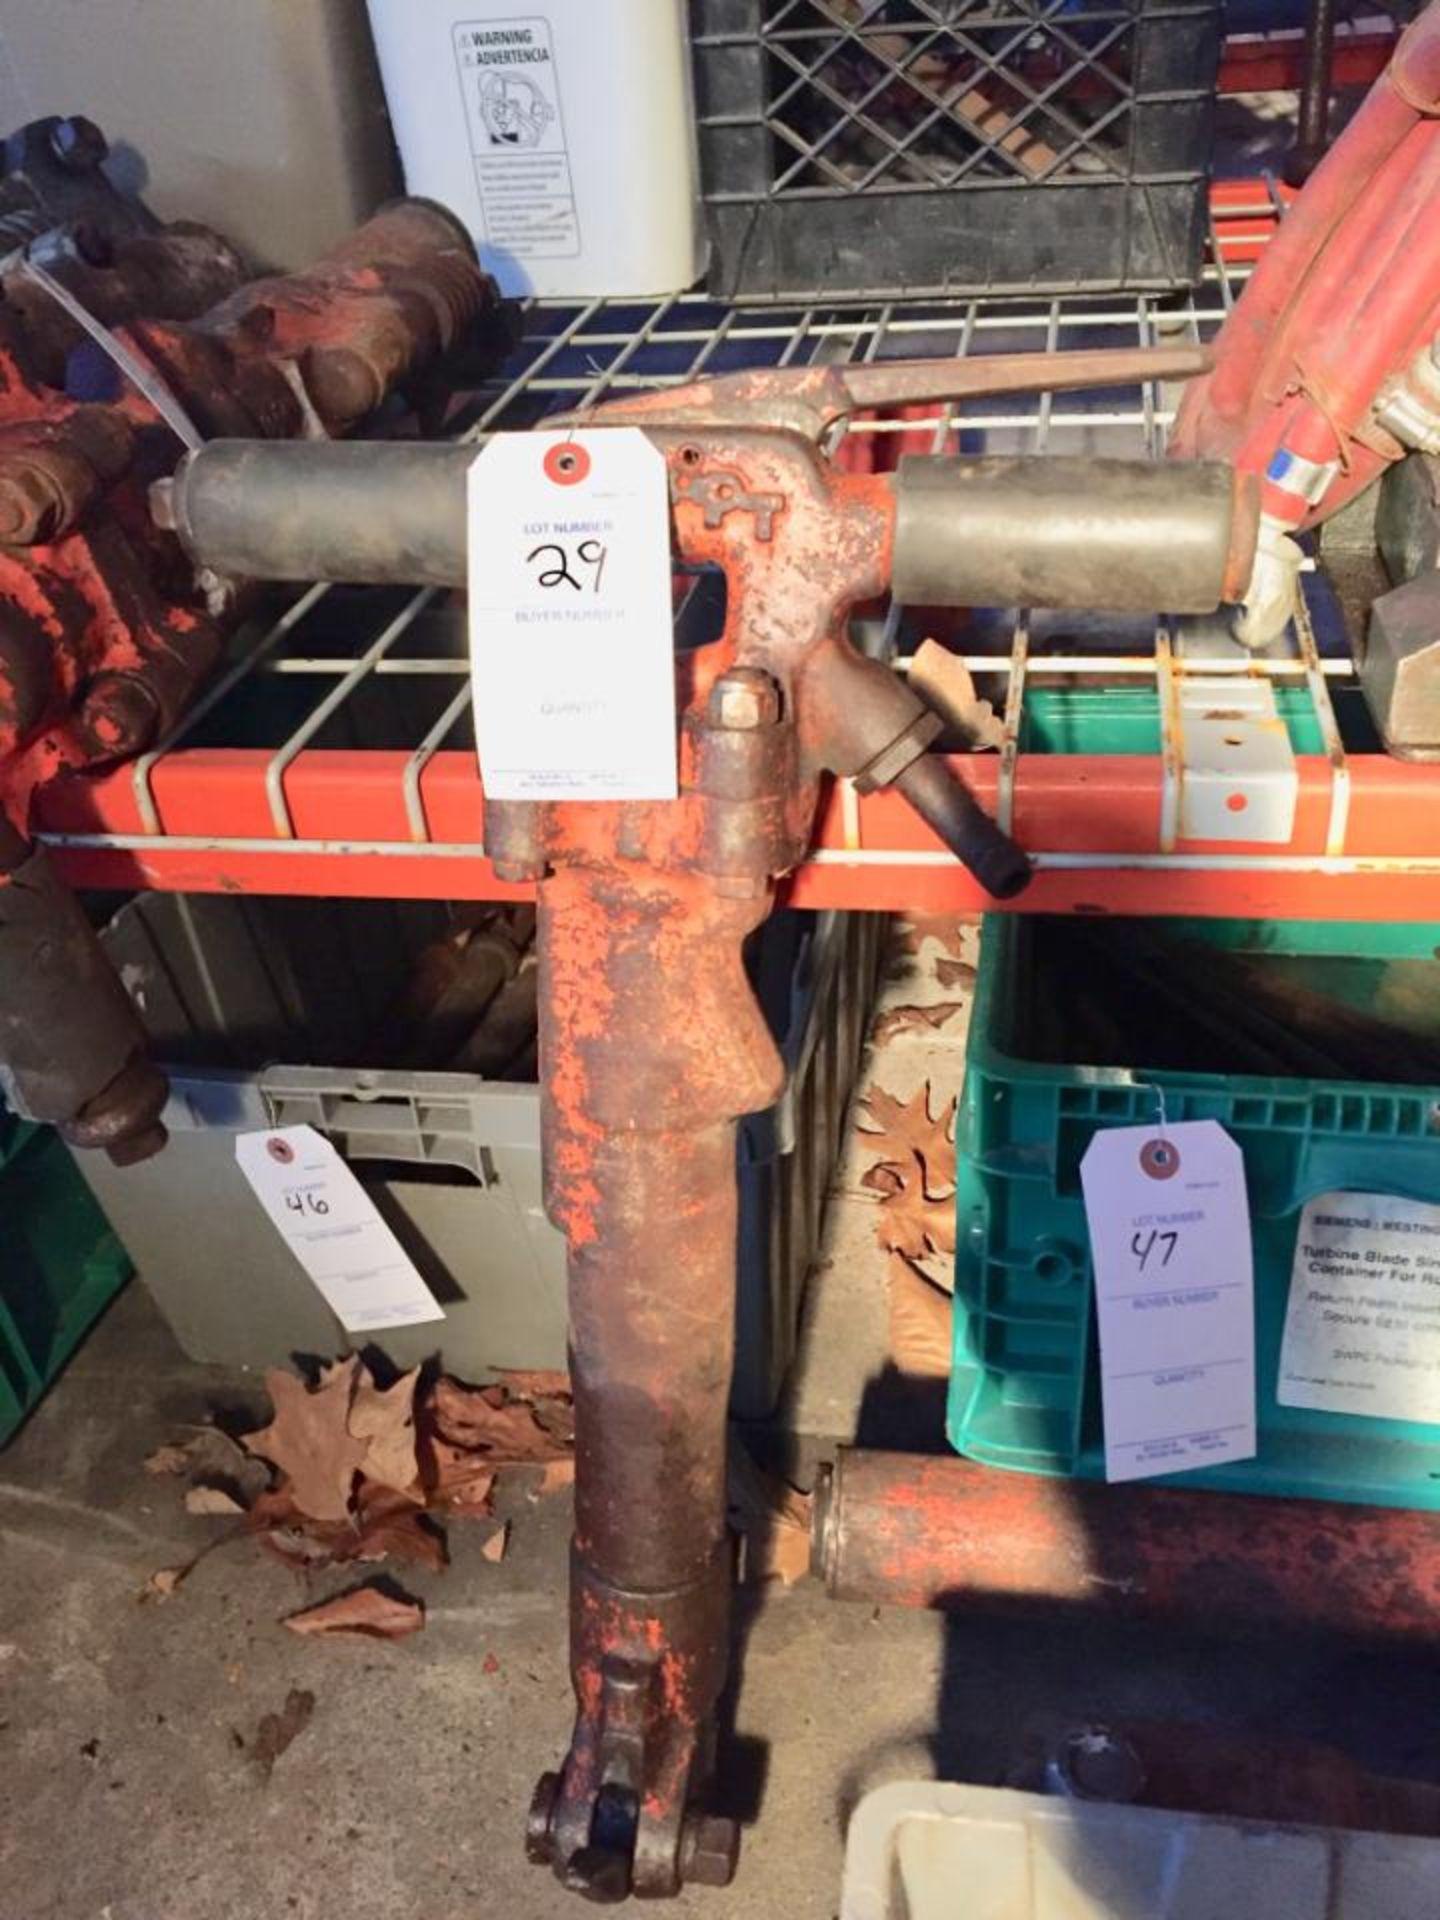 Lot 29 - (1) APT Jackhammer